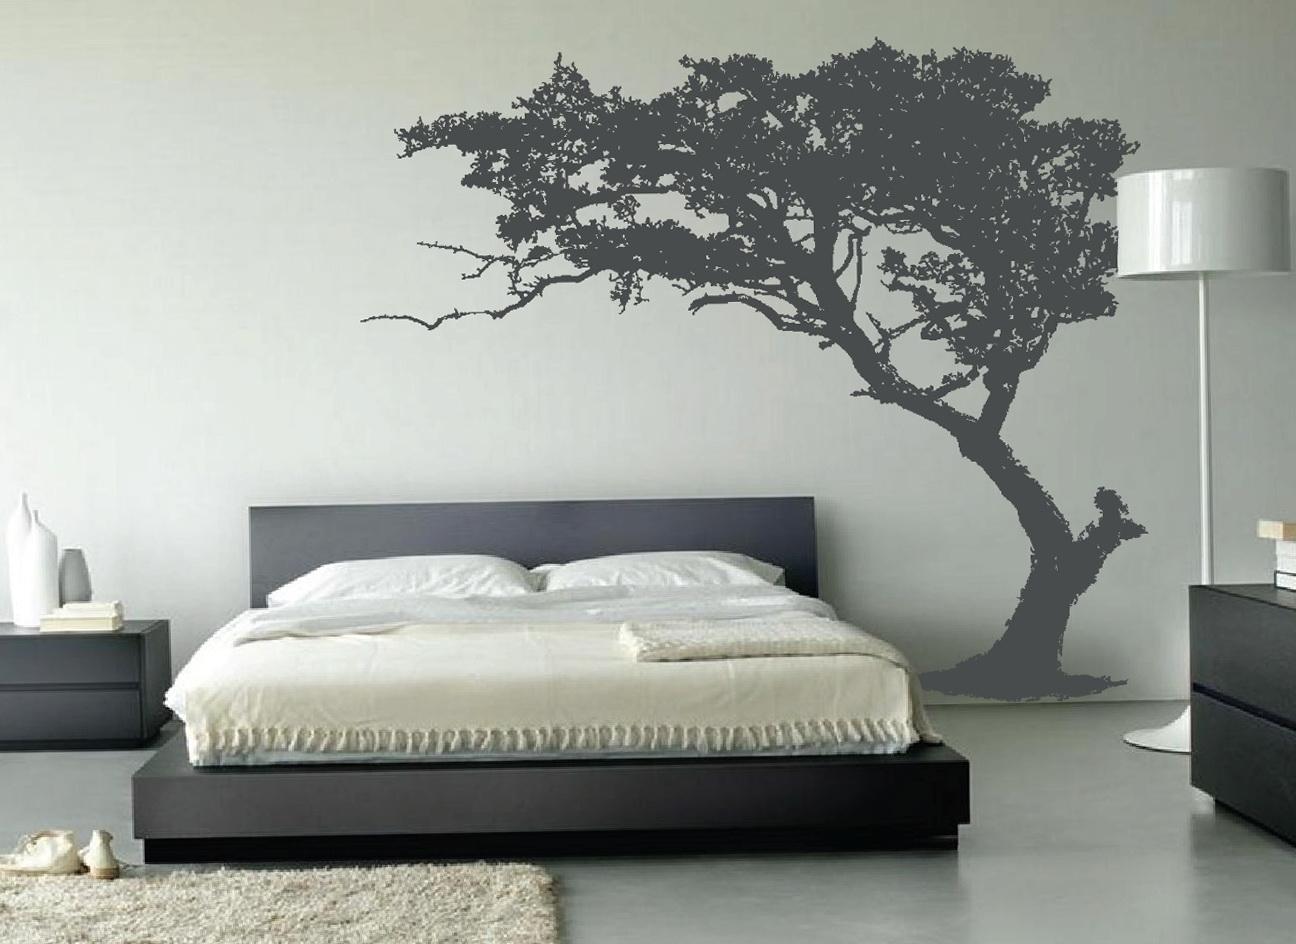 Wall Sticker Art For Bedroom